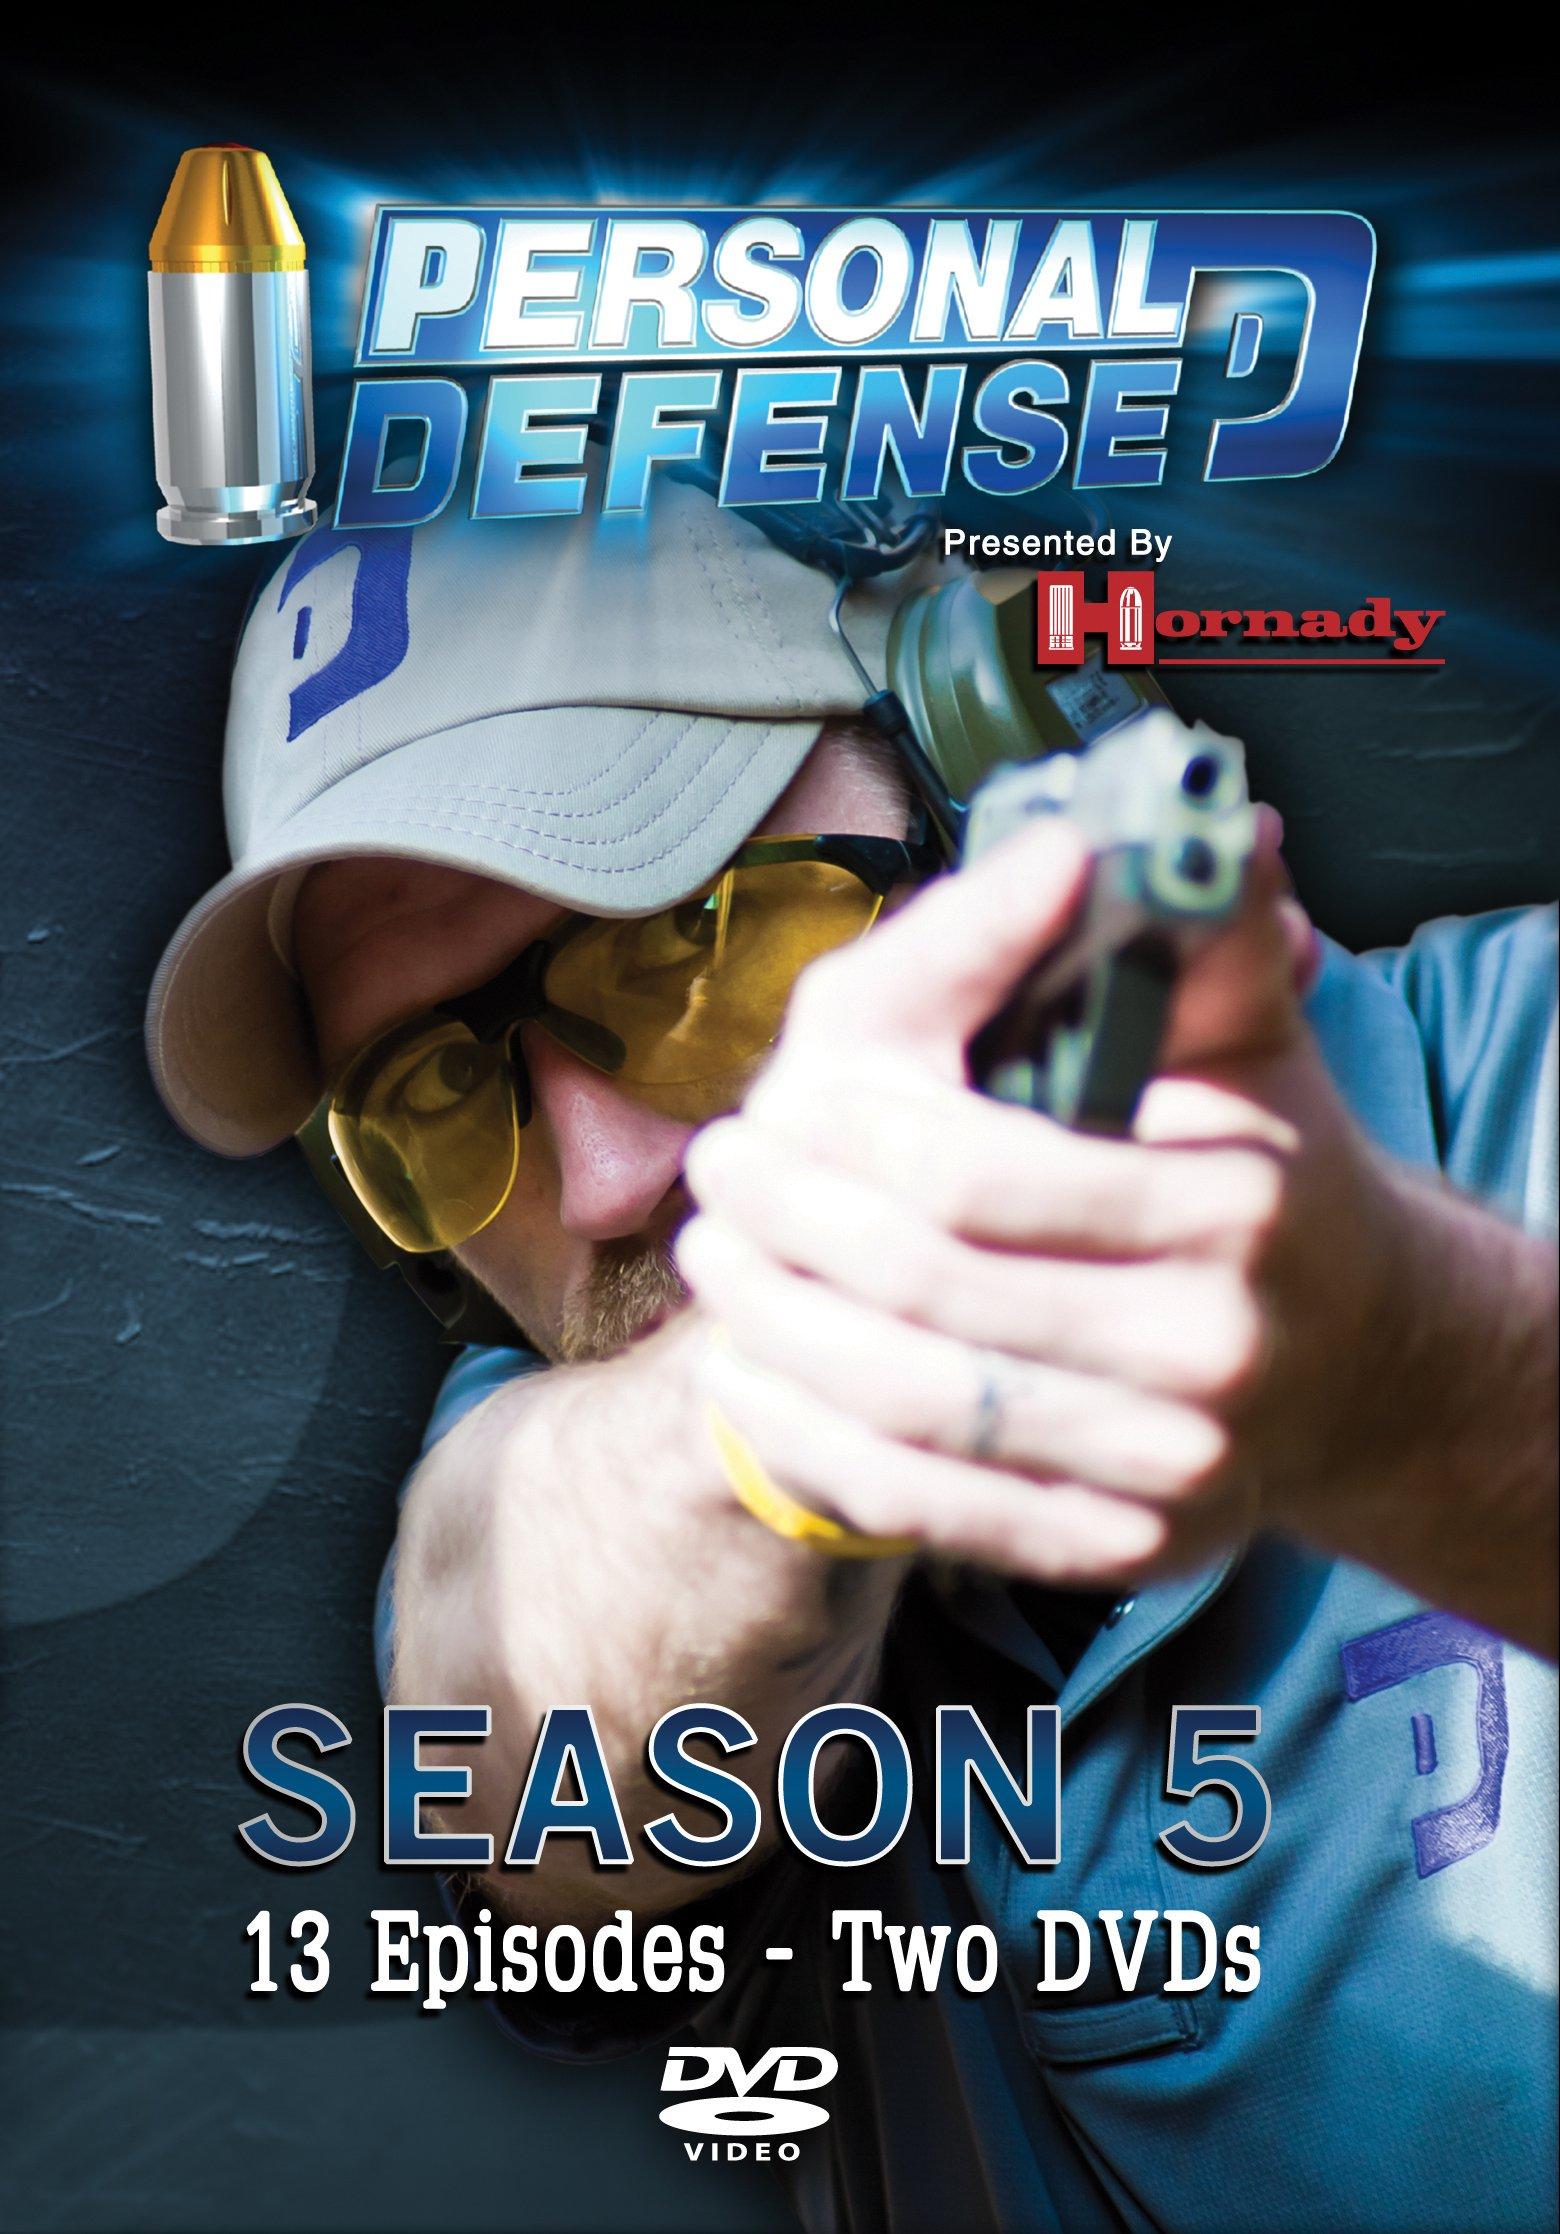 Personal Defense TV Season 5 (2010)